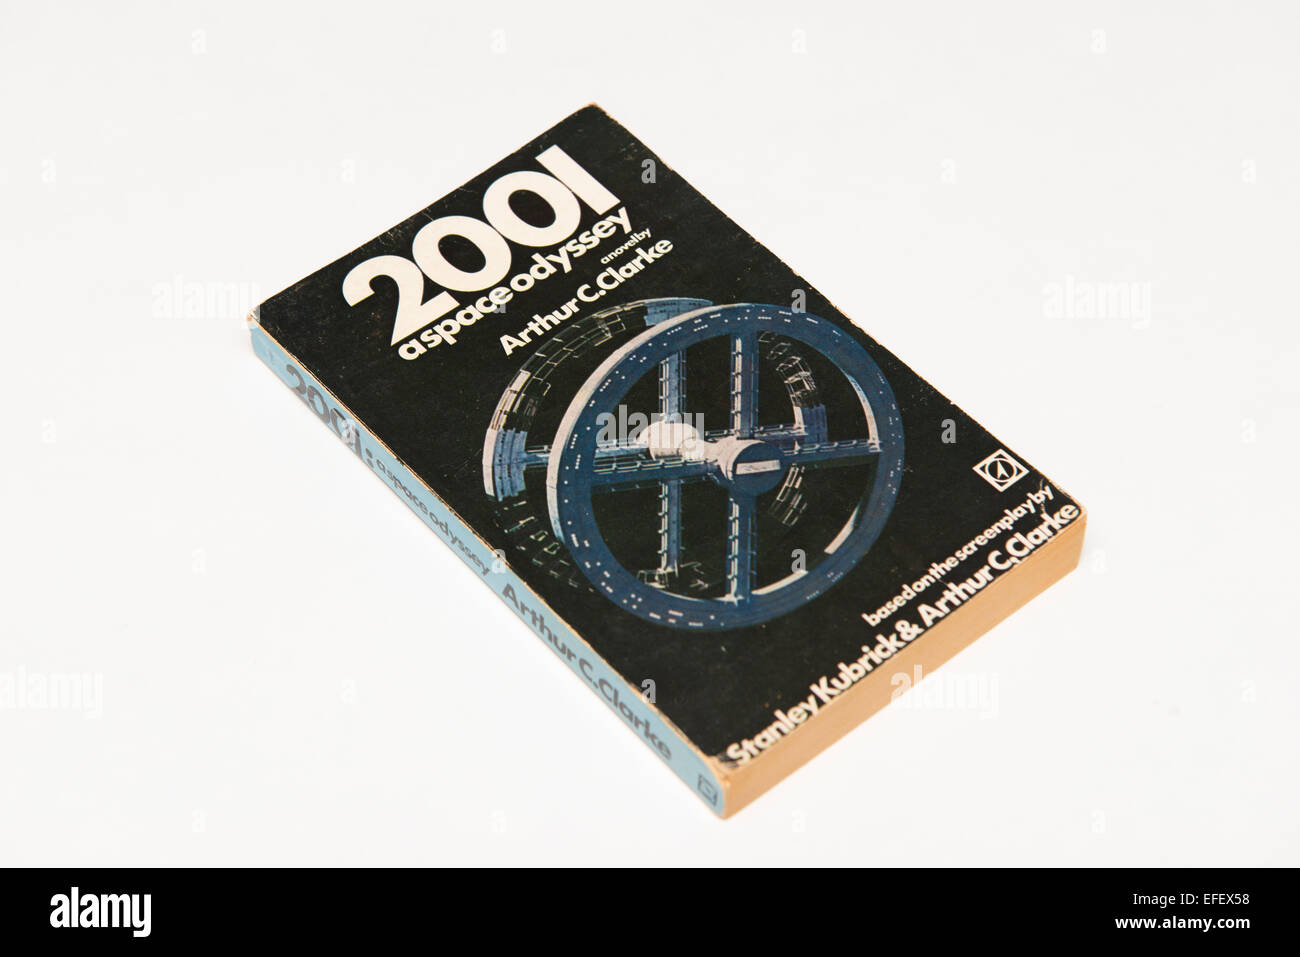 2001: A space Odyssey by Arthur C. Clarke. - Stock Image